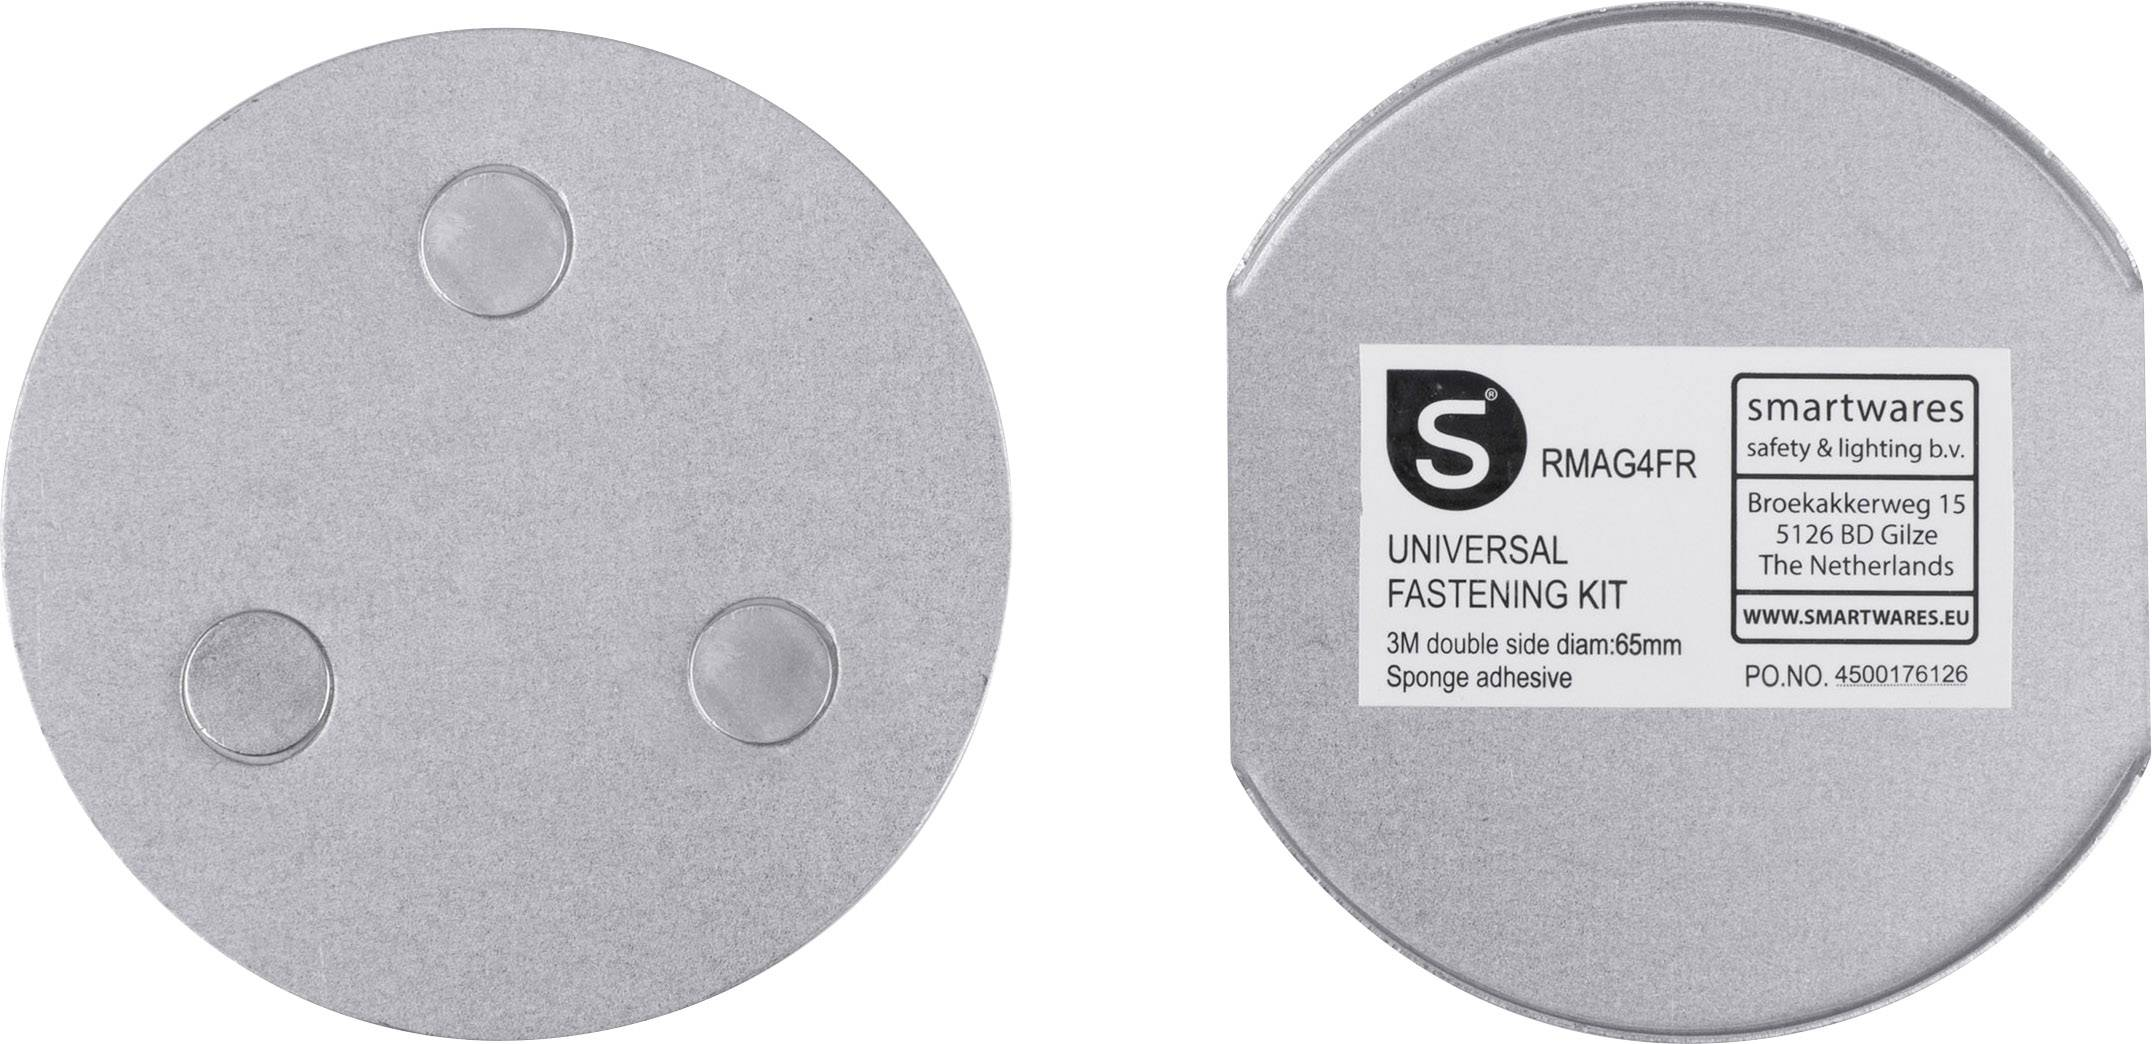 Magnetický držiak detektora dymu Smartwares RMAG4